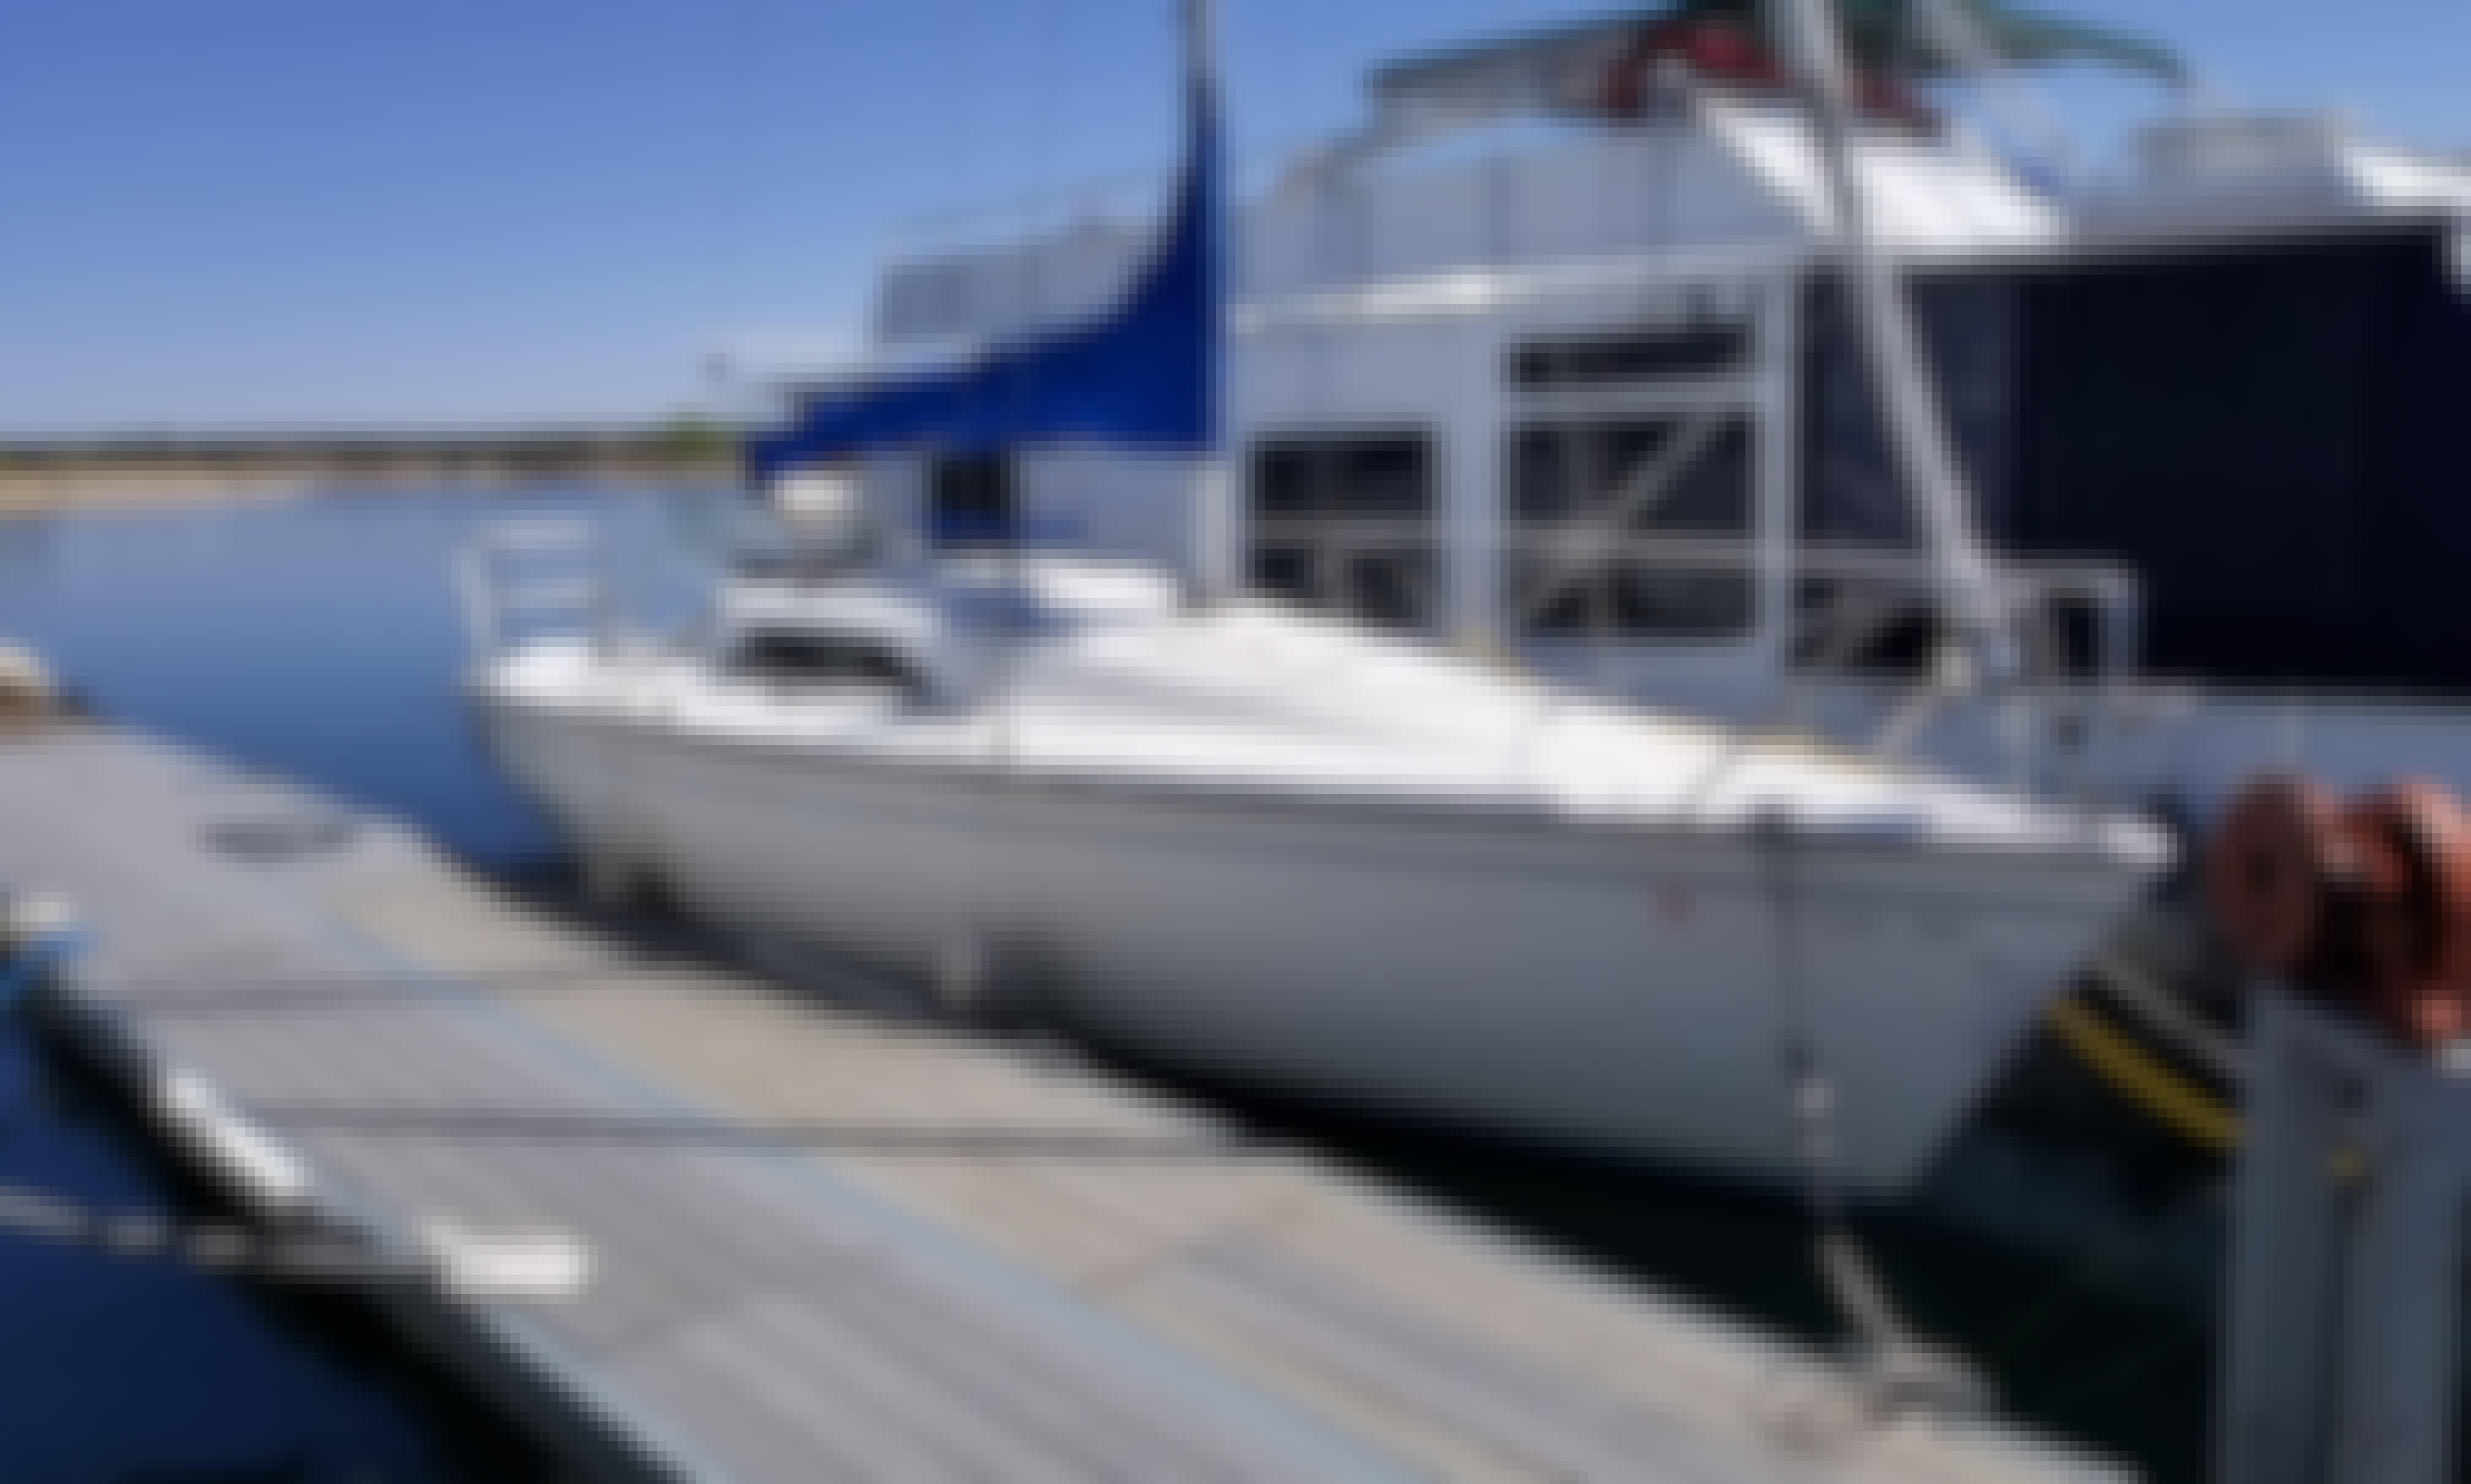 Easy to Sail Hunter 26.5' at Pueblo Reservoir